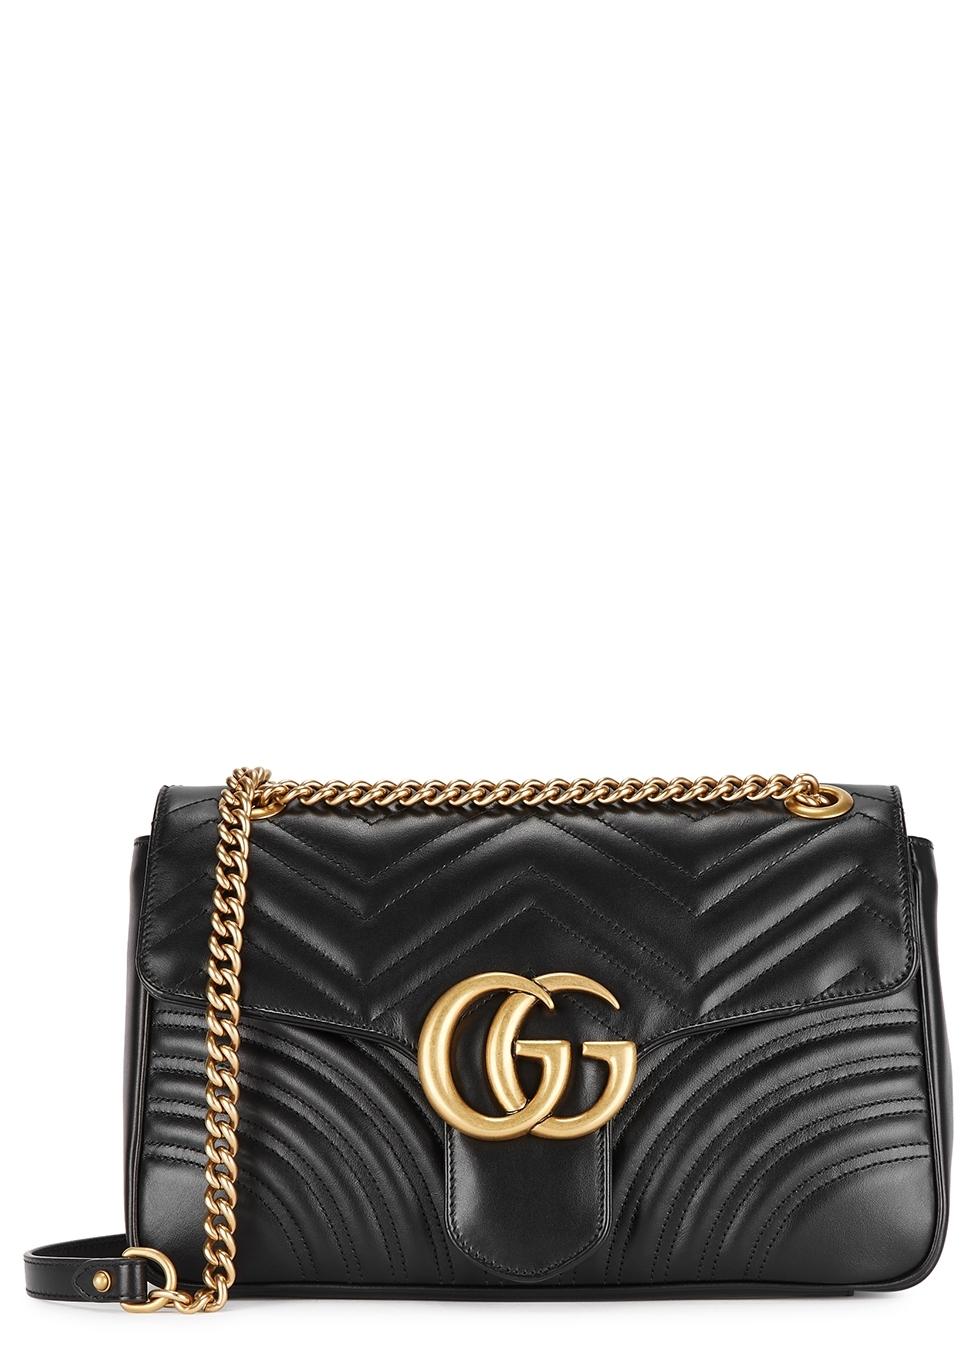 8033dd5f17f Gucci - Designer Clothes - Harvey Nichols